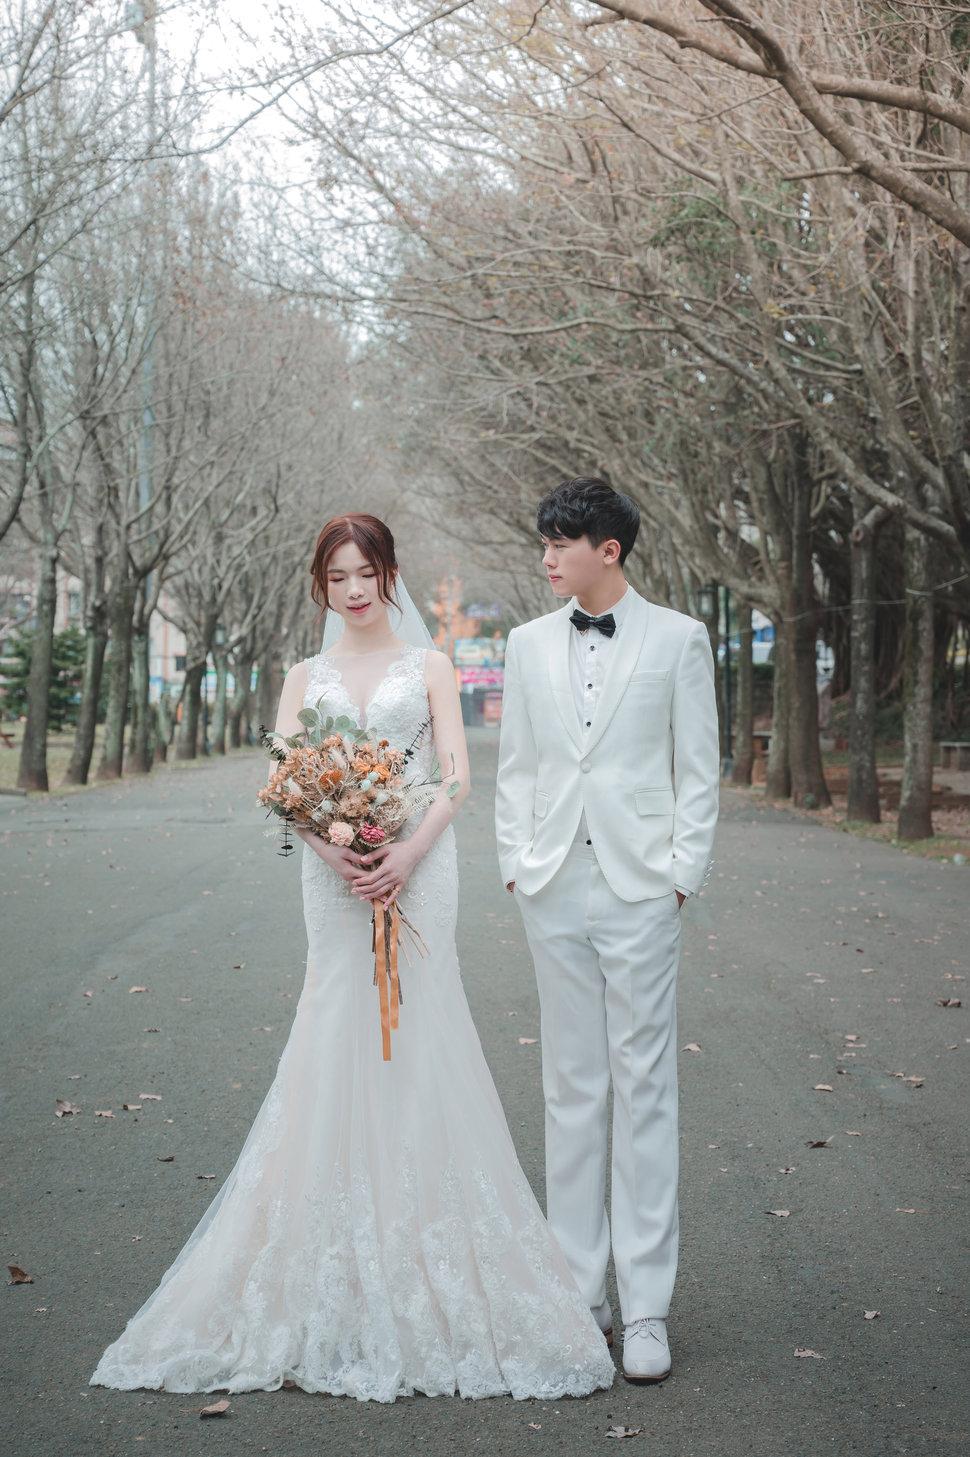 20200111-YEU_5504-1 - 花蓮婚紗 - Sposa Bella《結婚吧》